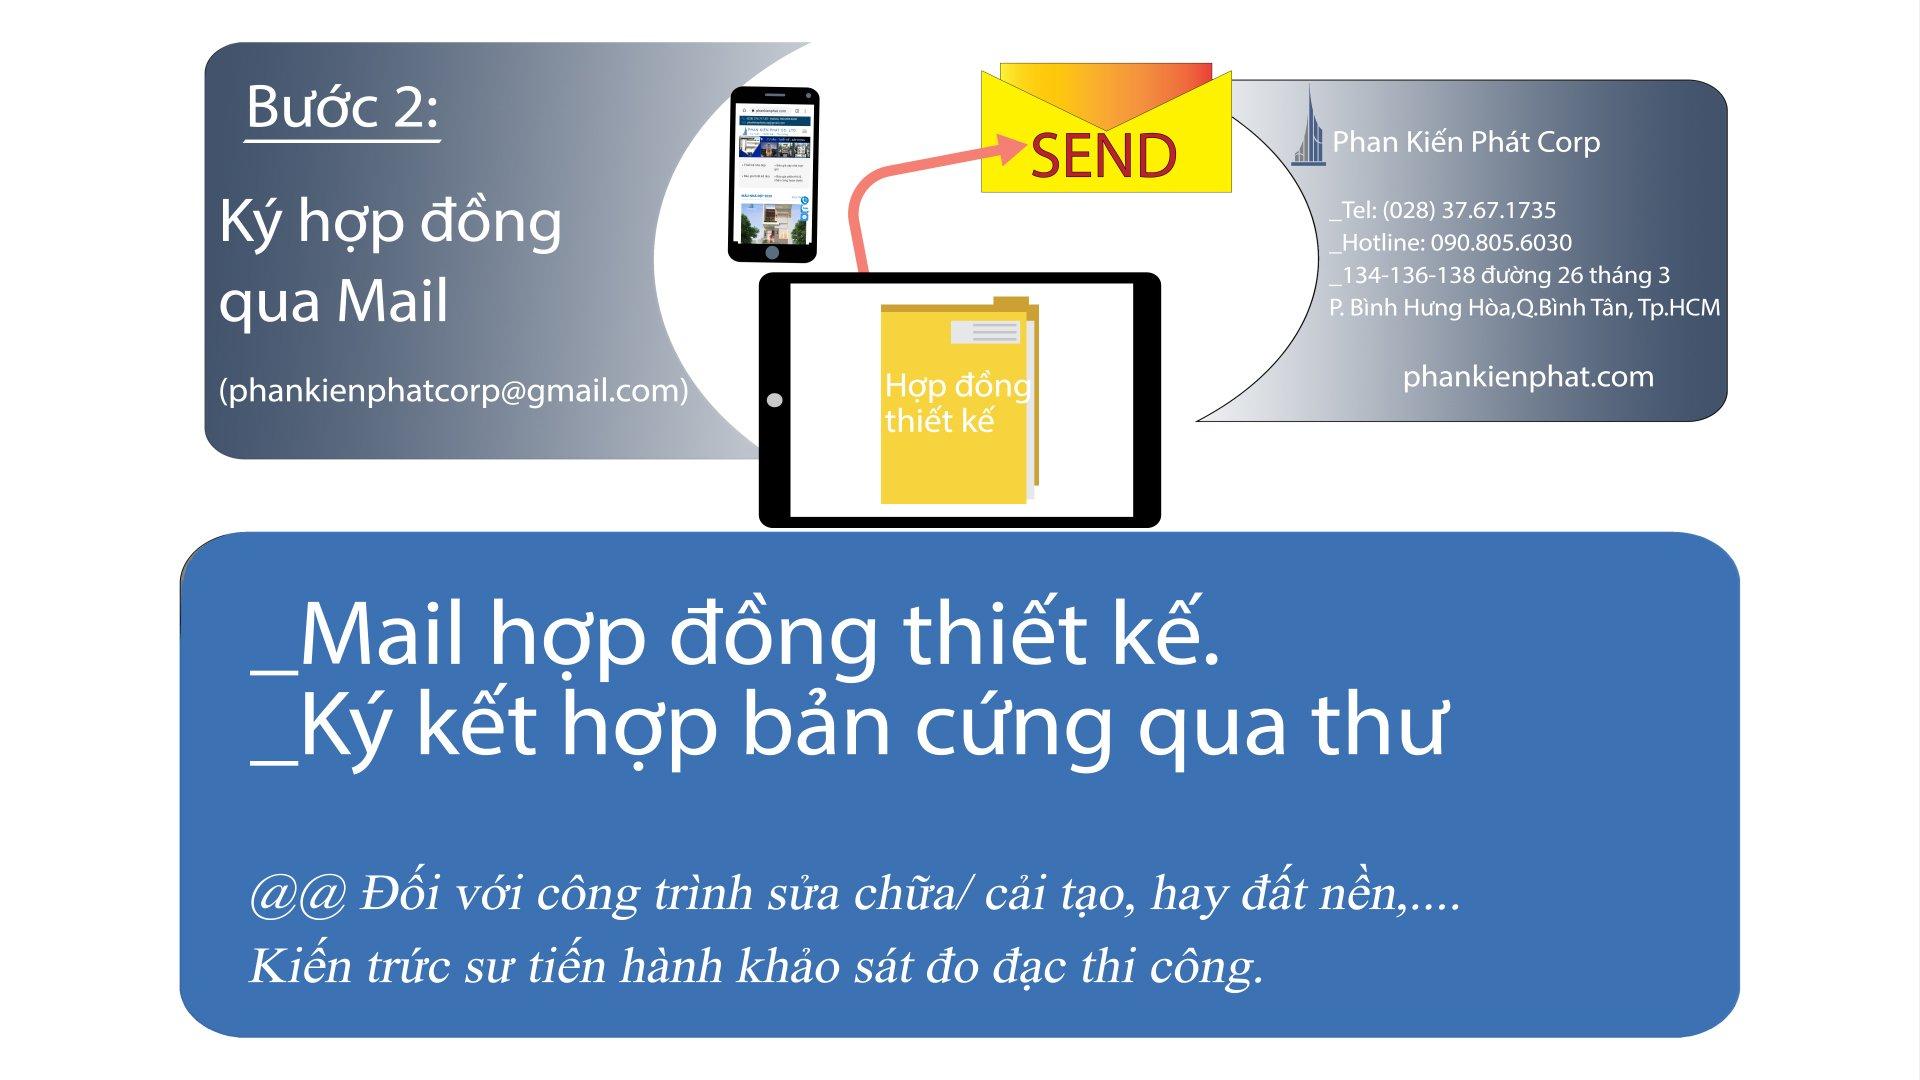 Quy Trinh Tu Van Thiet Ke Xay Dung Nha Truc Tuyen Buoc 2 Tkxdnd